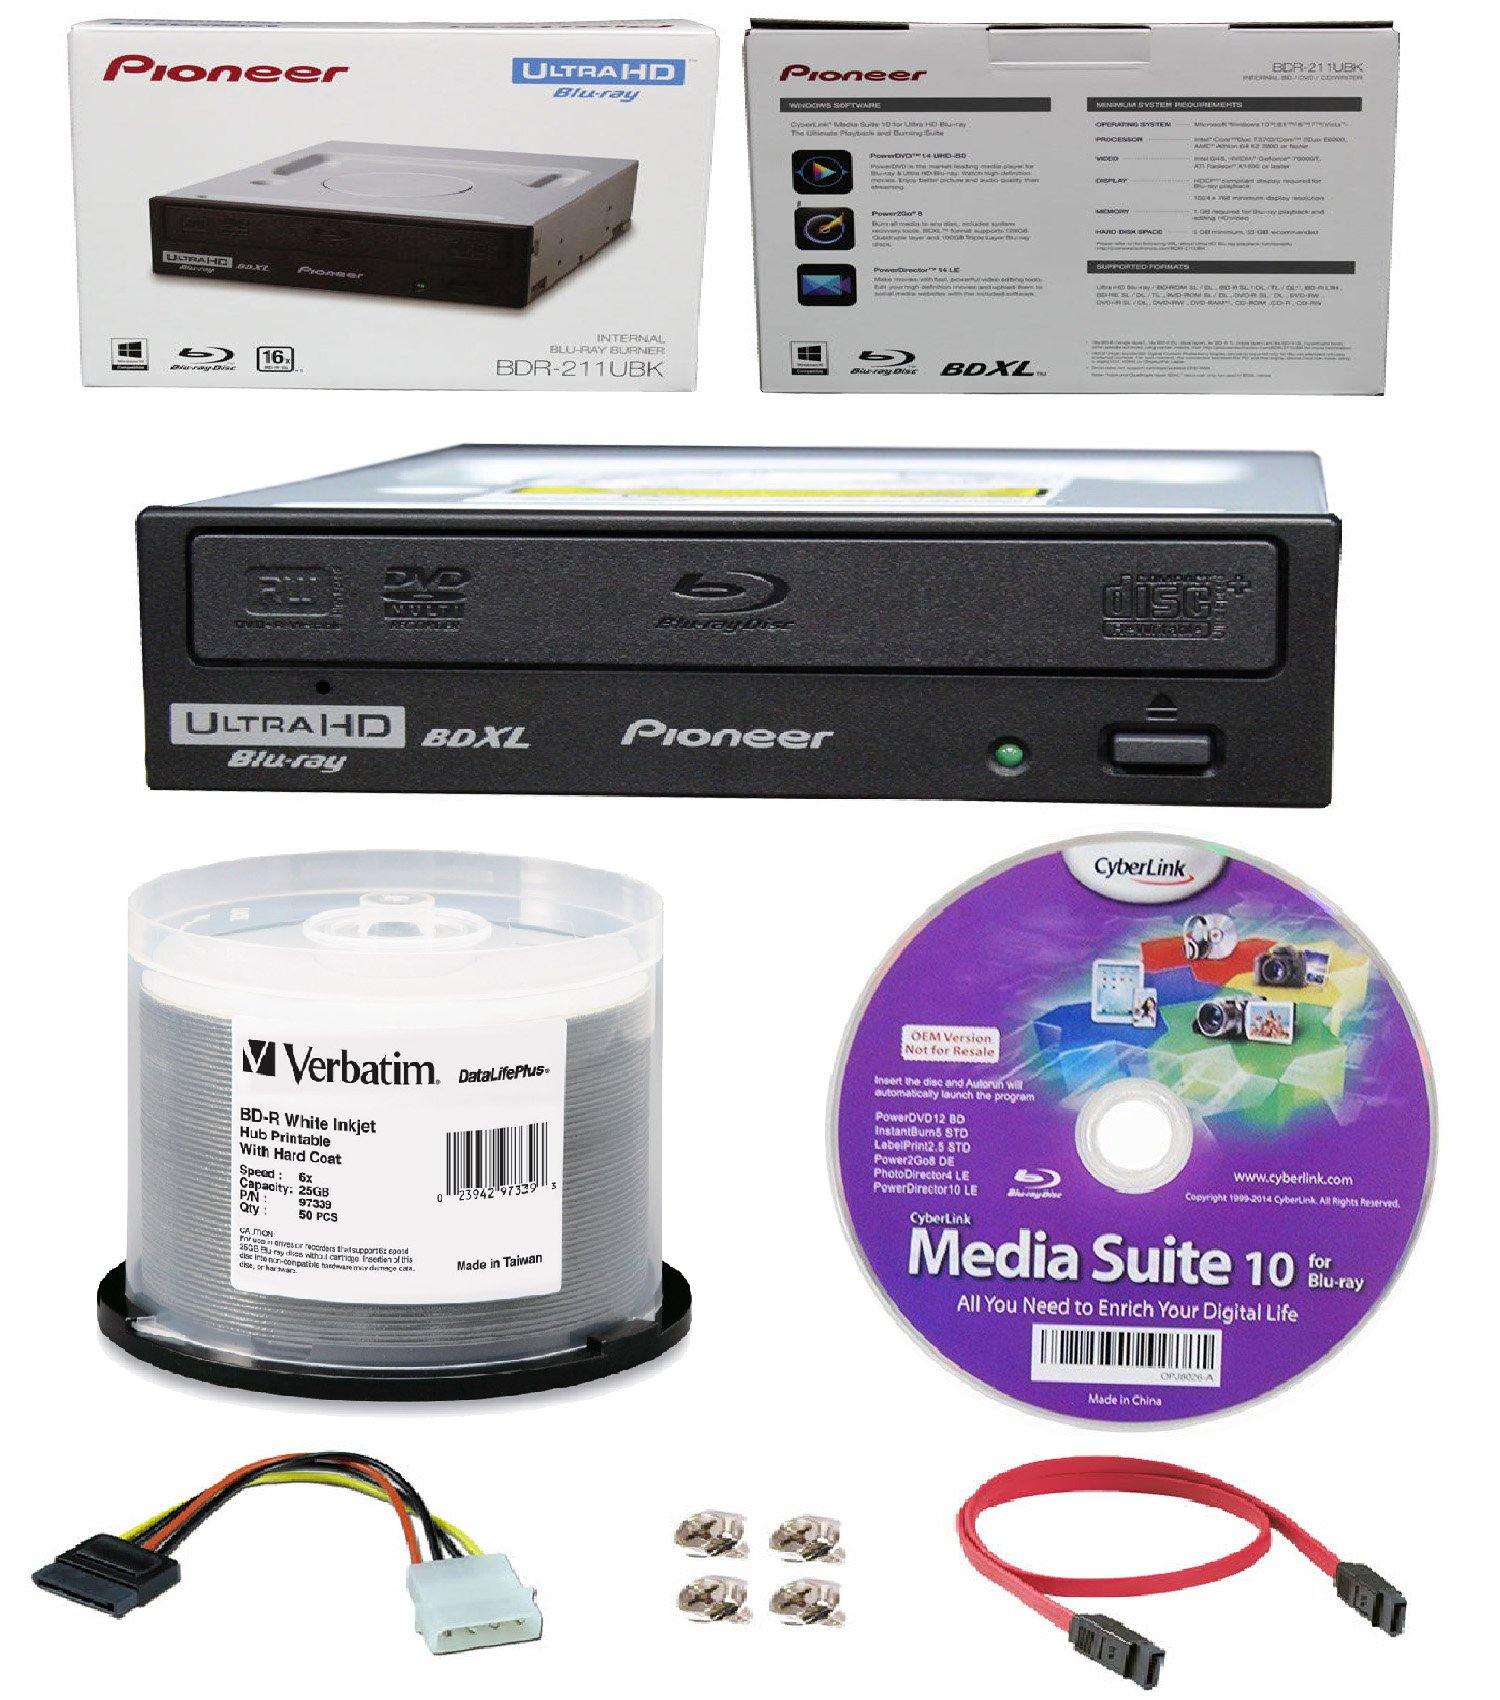 Pioneer 16x BDR-211UBK Internal Ultra HD Blu-ray BDXL Burner, Cyberlink Software and Cable Accessories Bundle with 50pk BD-R Verbatim 25GB 6X DataLifePlus White Inkjet, Hub Printable by Produplicator